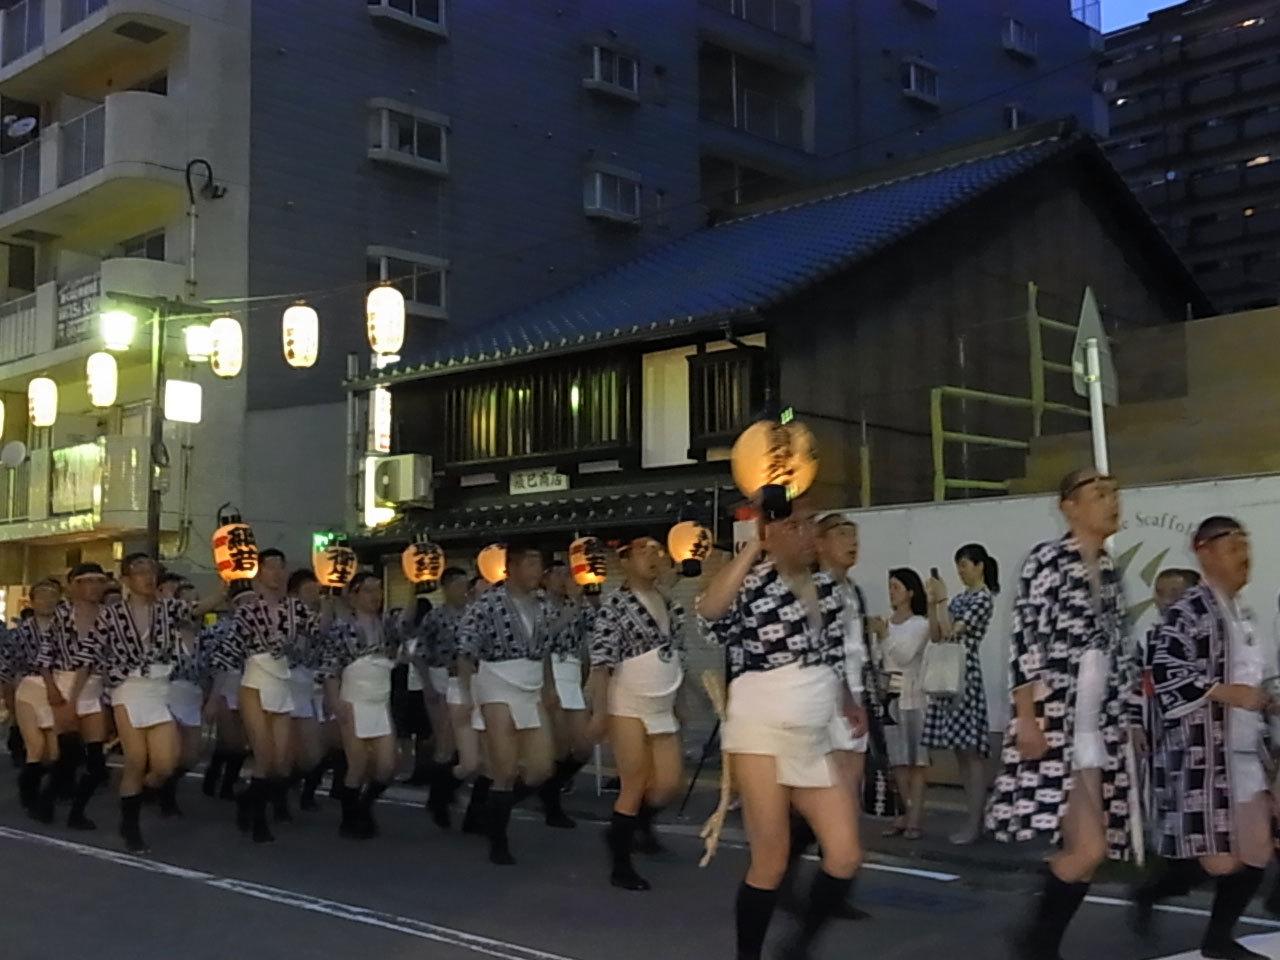 博多祇園山笠.....今年も..._d0127182_16081744.jpg